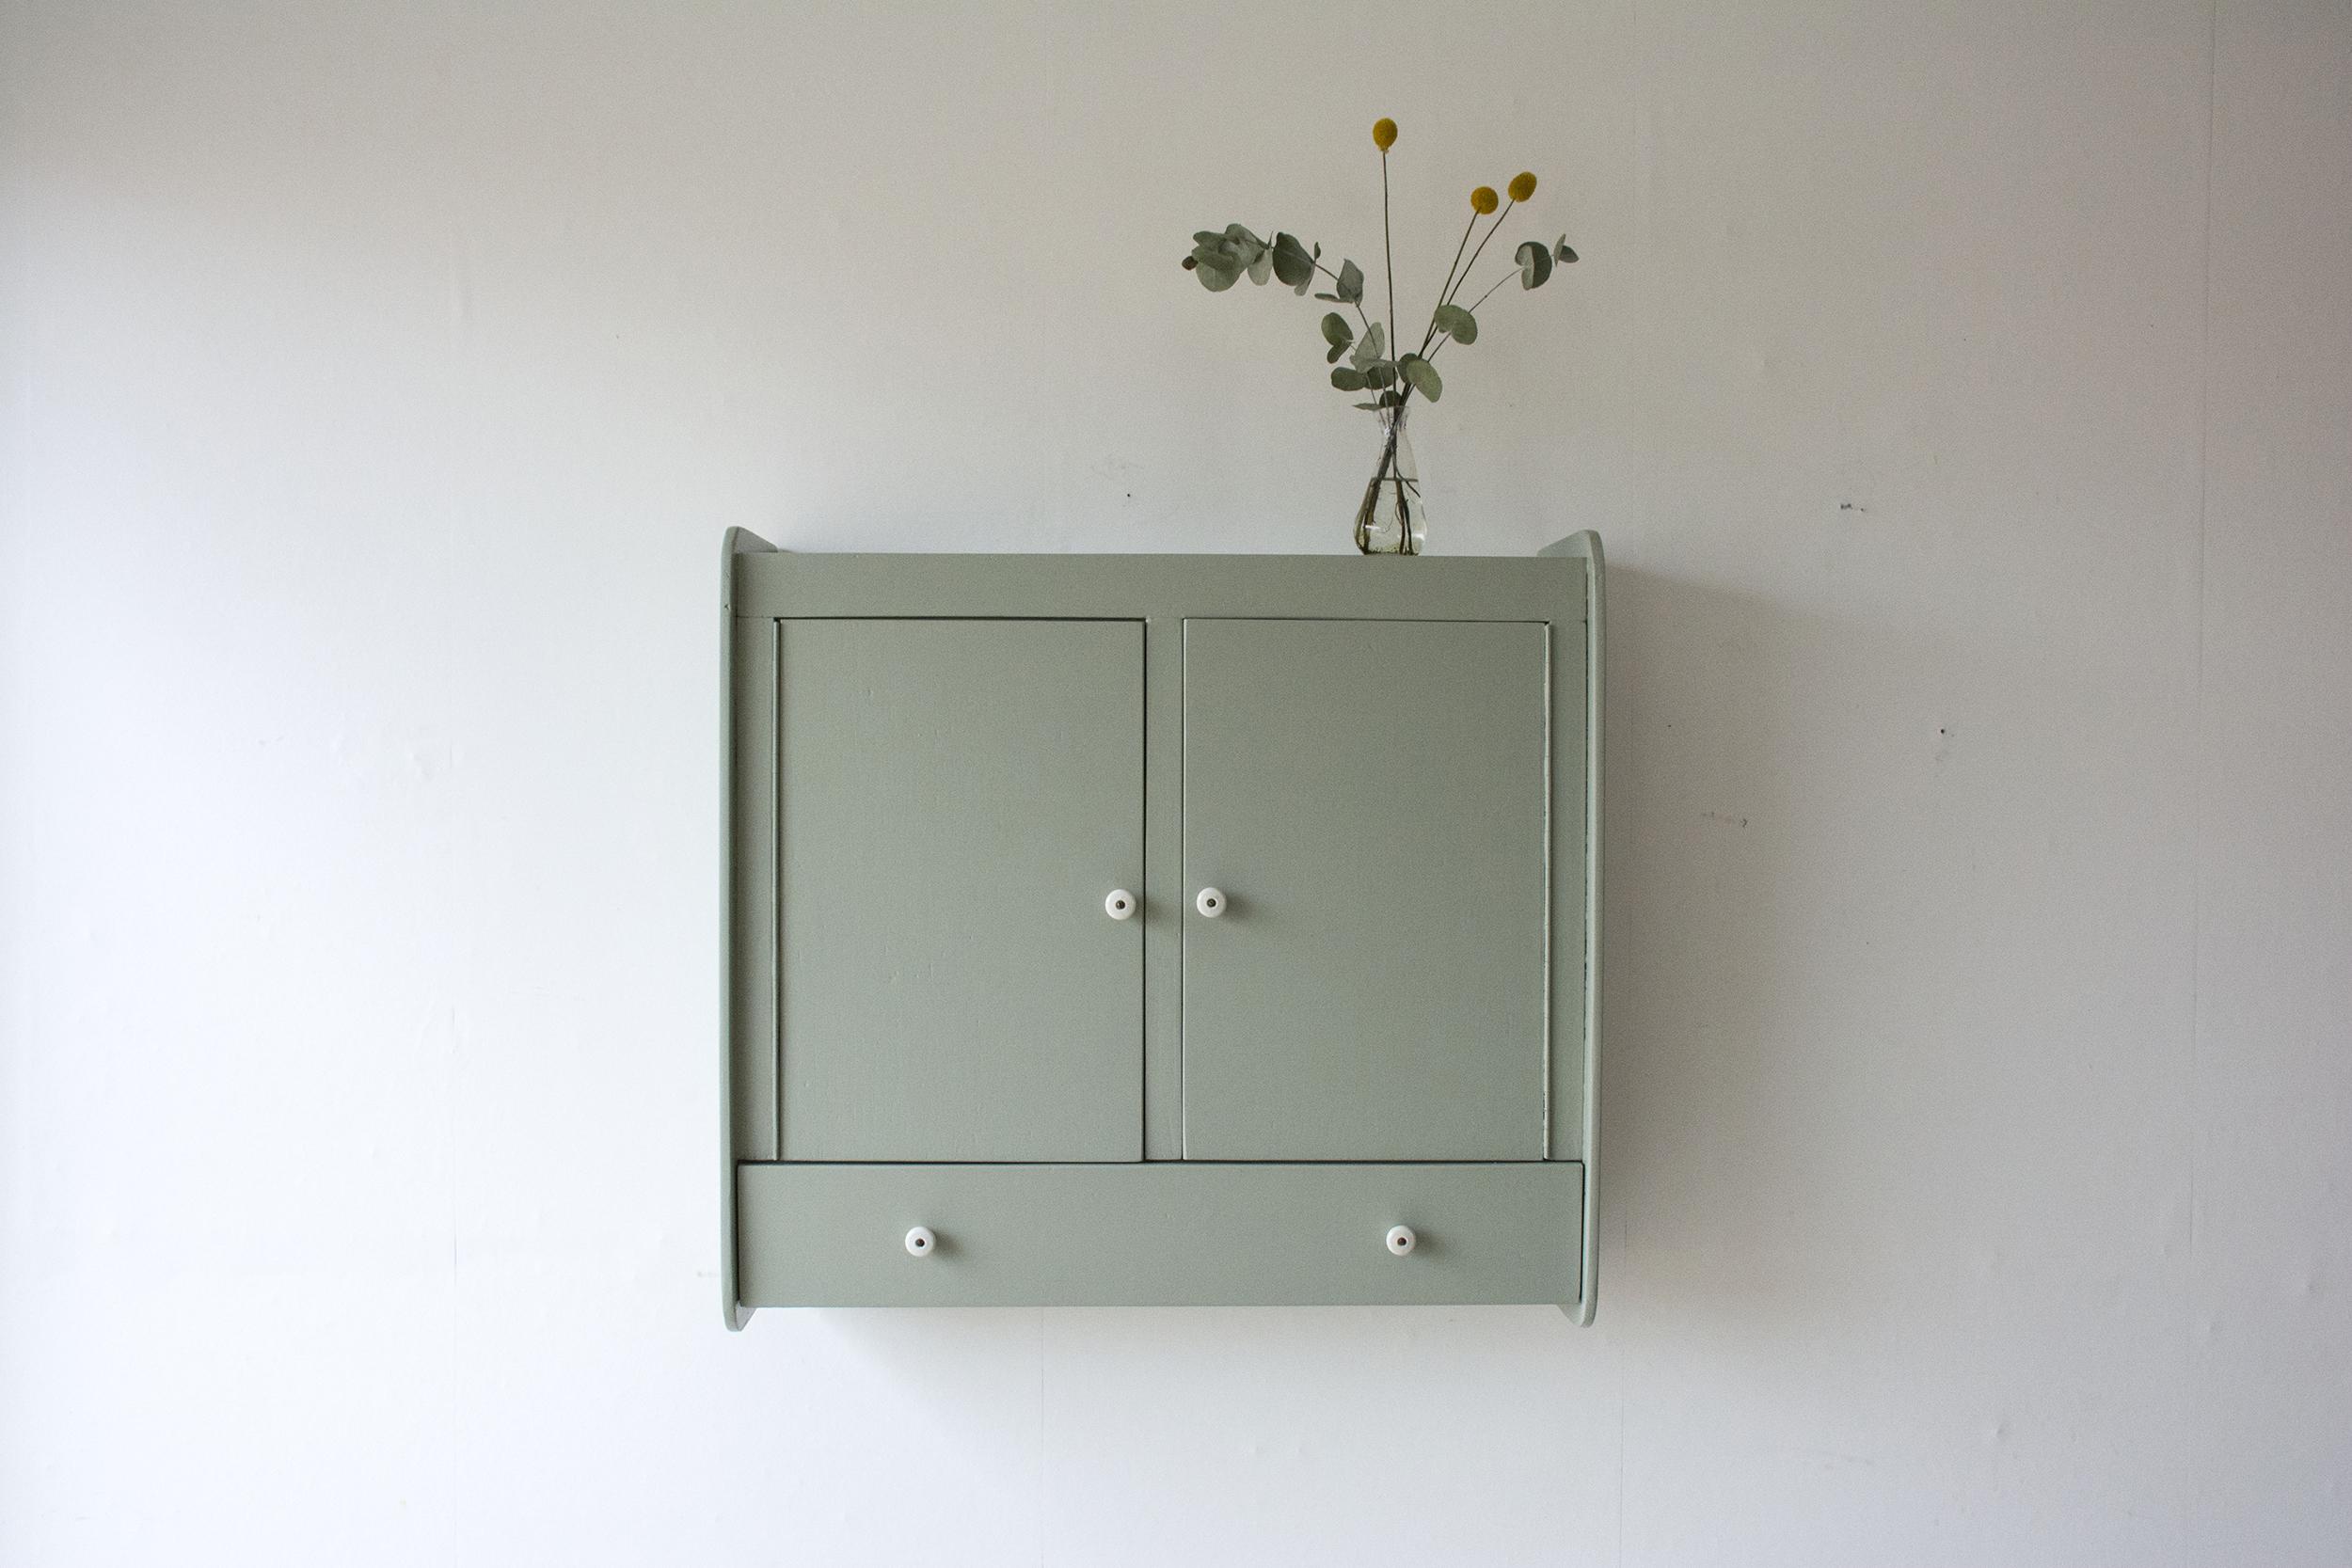 tijmgroen wandkastje met deurtjes en klepla - Firma zoethout_1.jpg